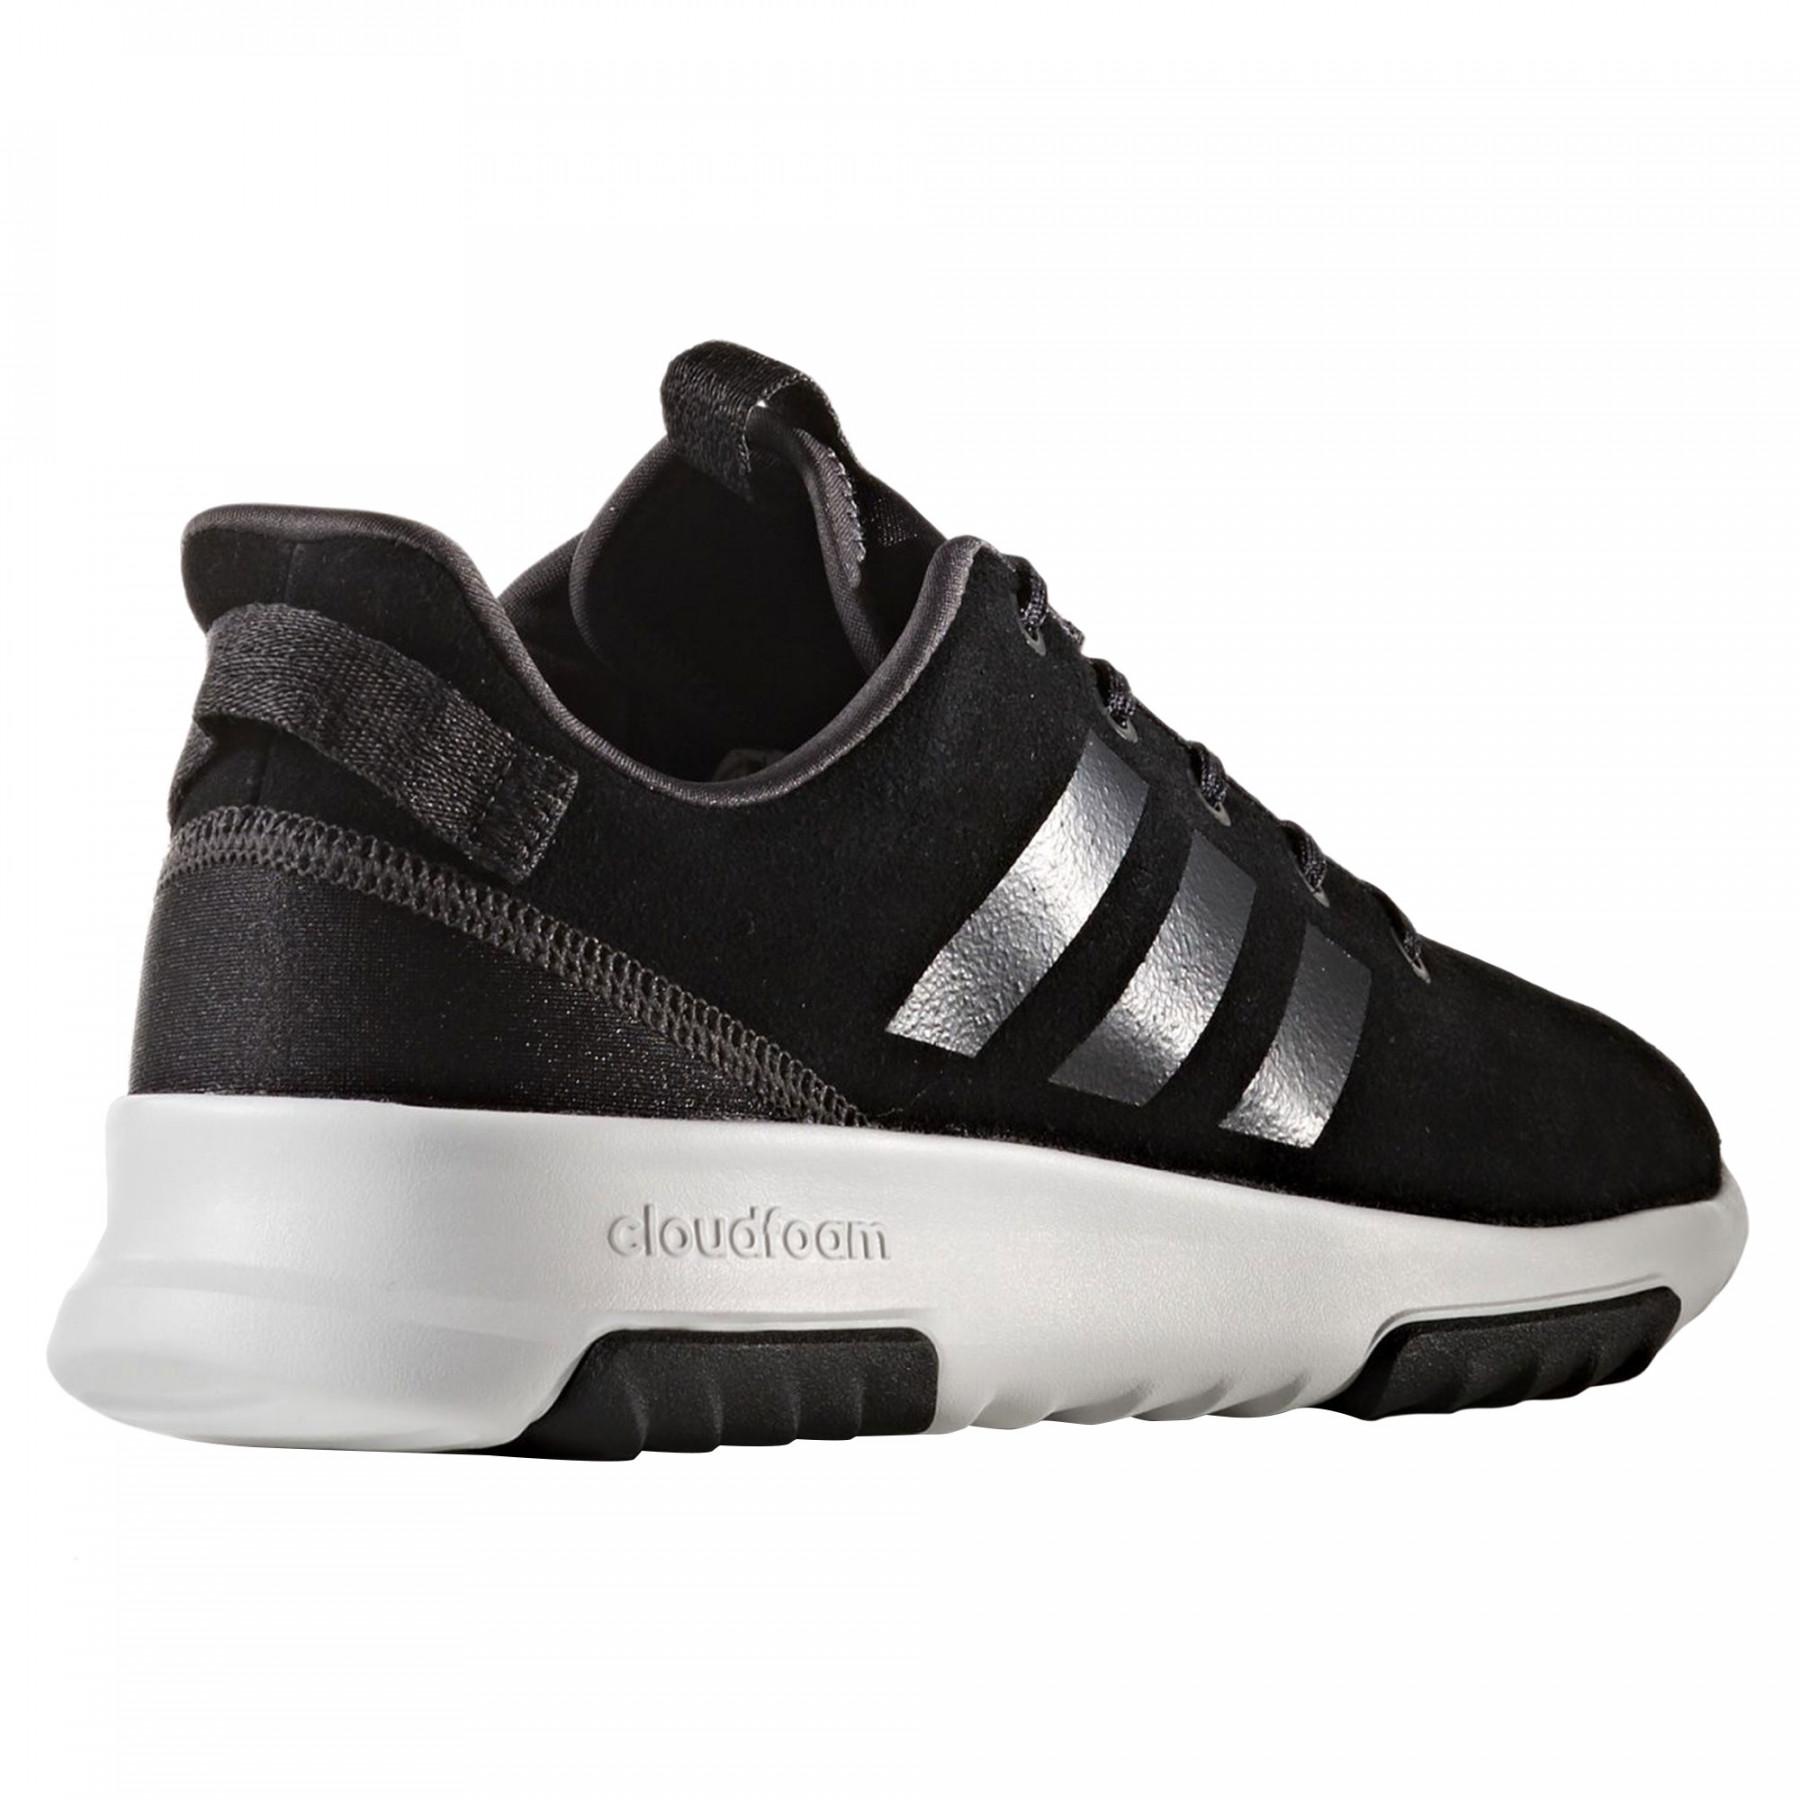 Baskets Basses Cher Racer Noir Femme Cf Adidas Chaussure Trw Pas FKcJlT13